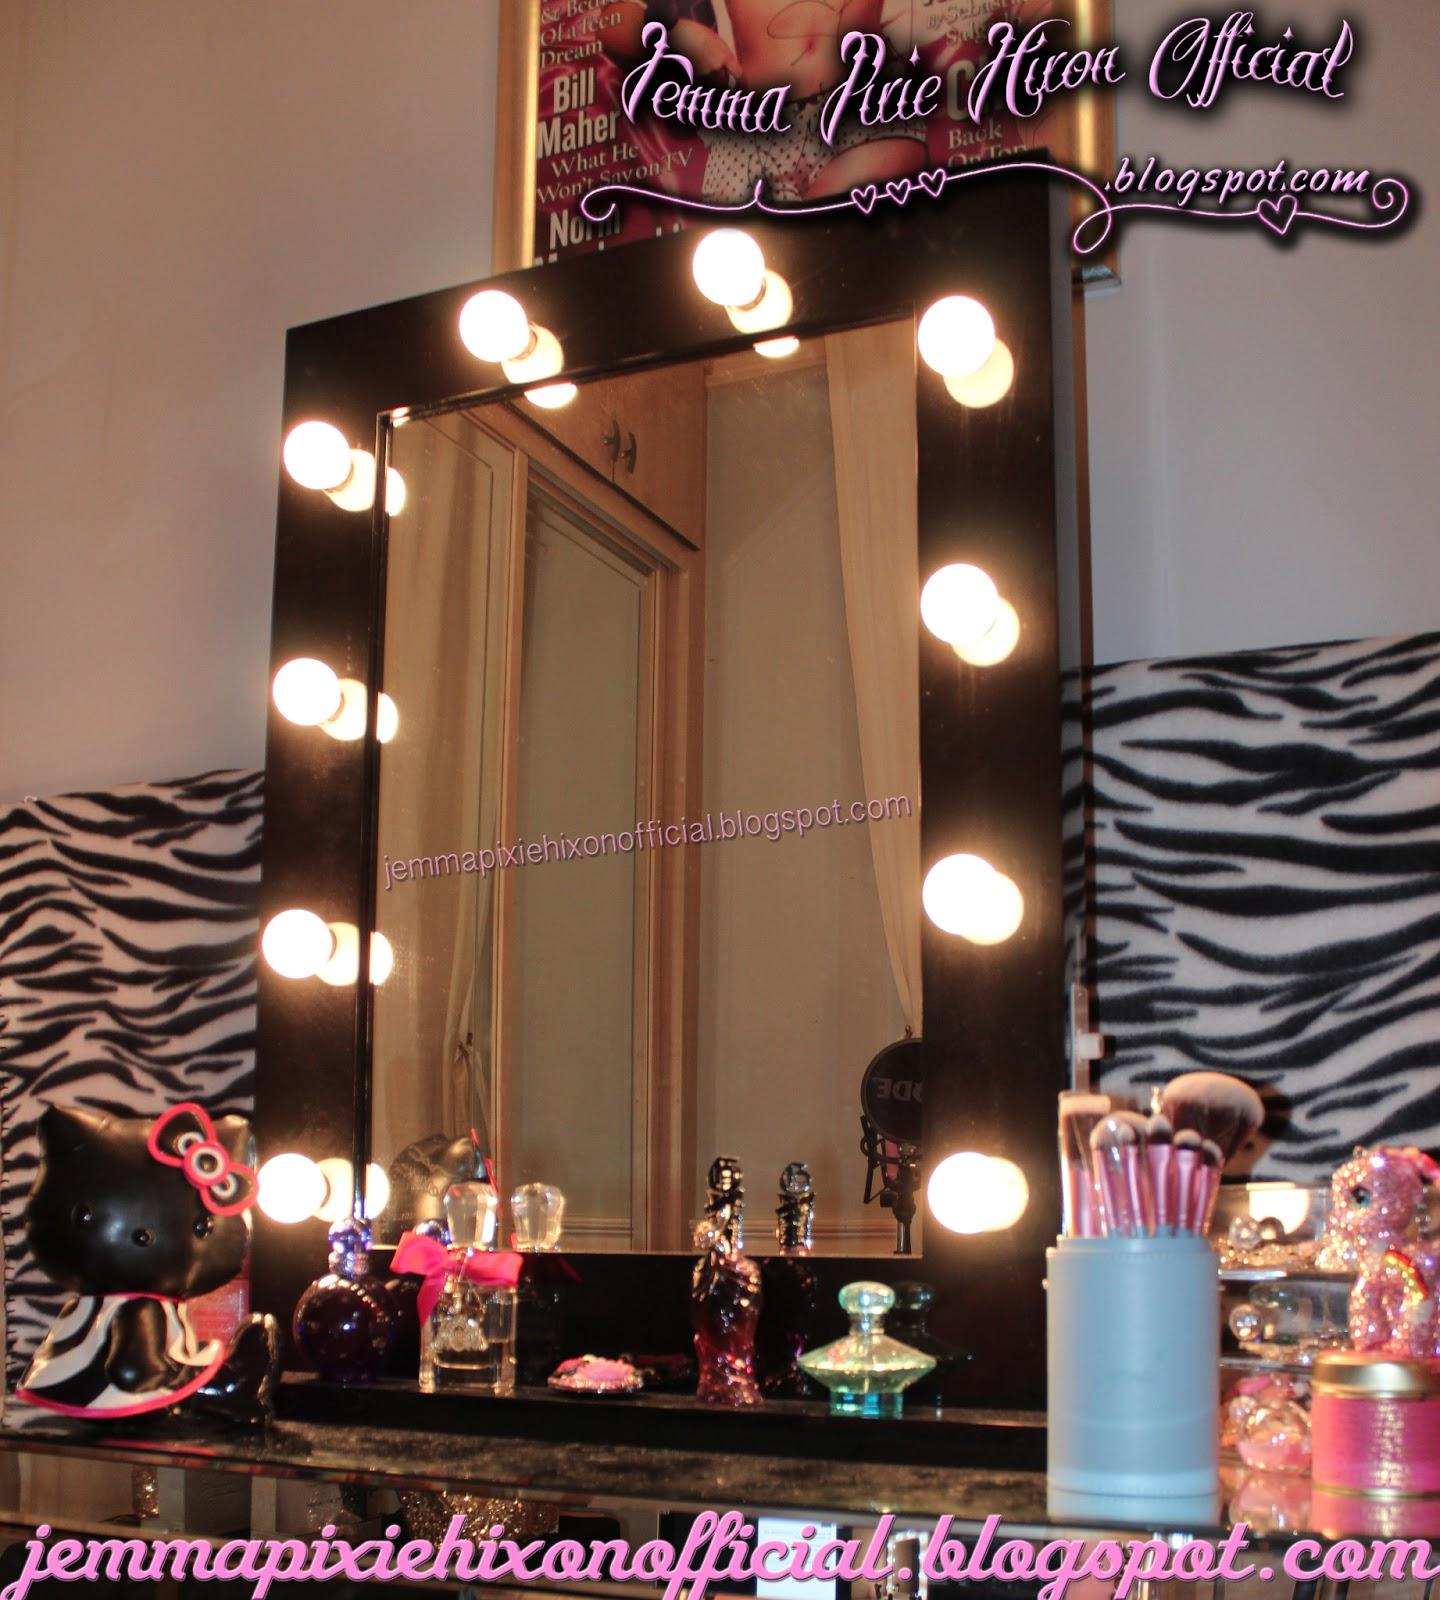 jemma pixie hixon 39 s official blog my hollywood mirror. Black Bedroom Furniture Sets. Home Design Ideas